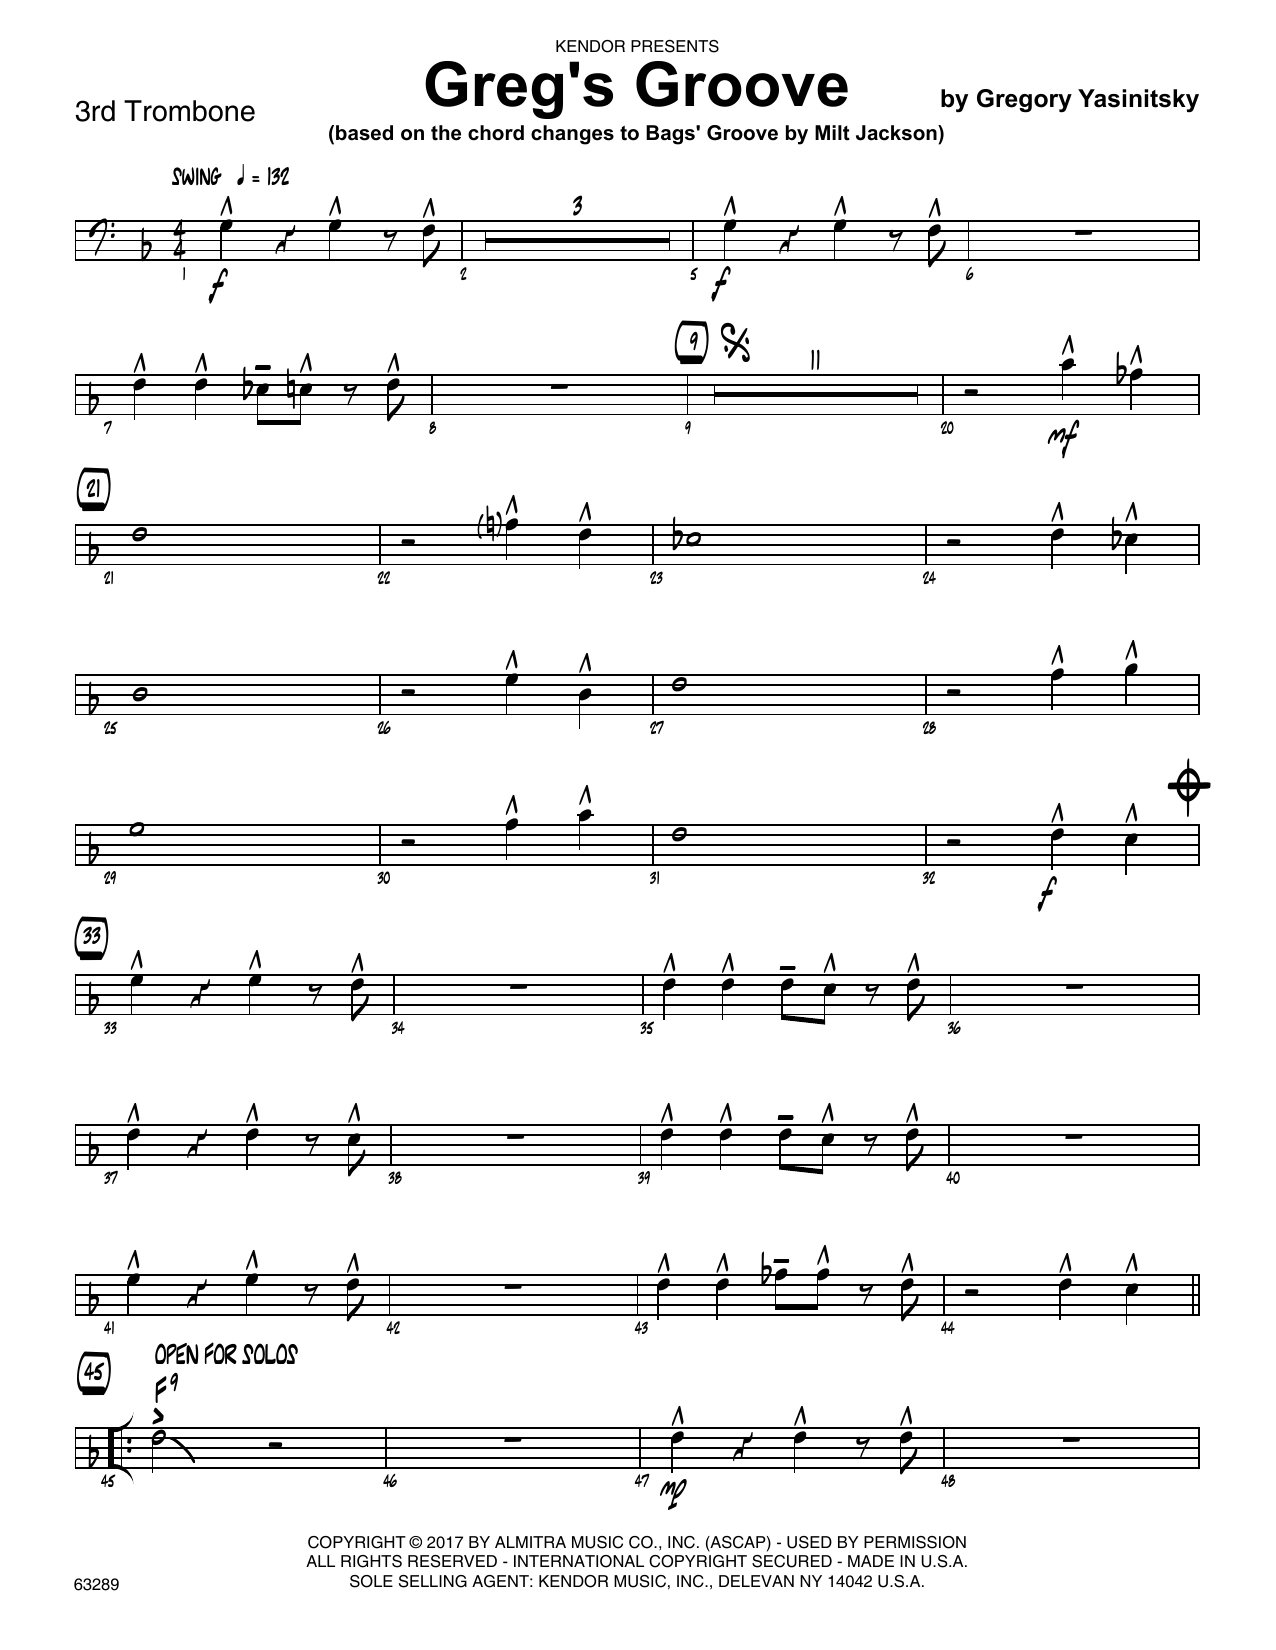 Greg's Groove - 3rd Trombone Sheet Music